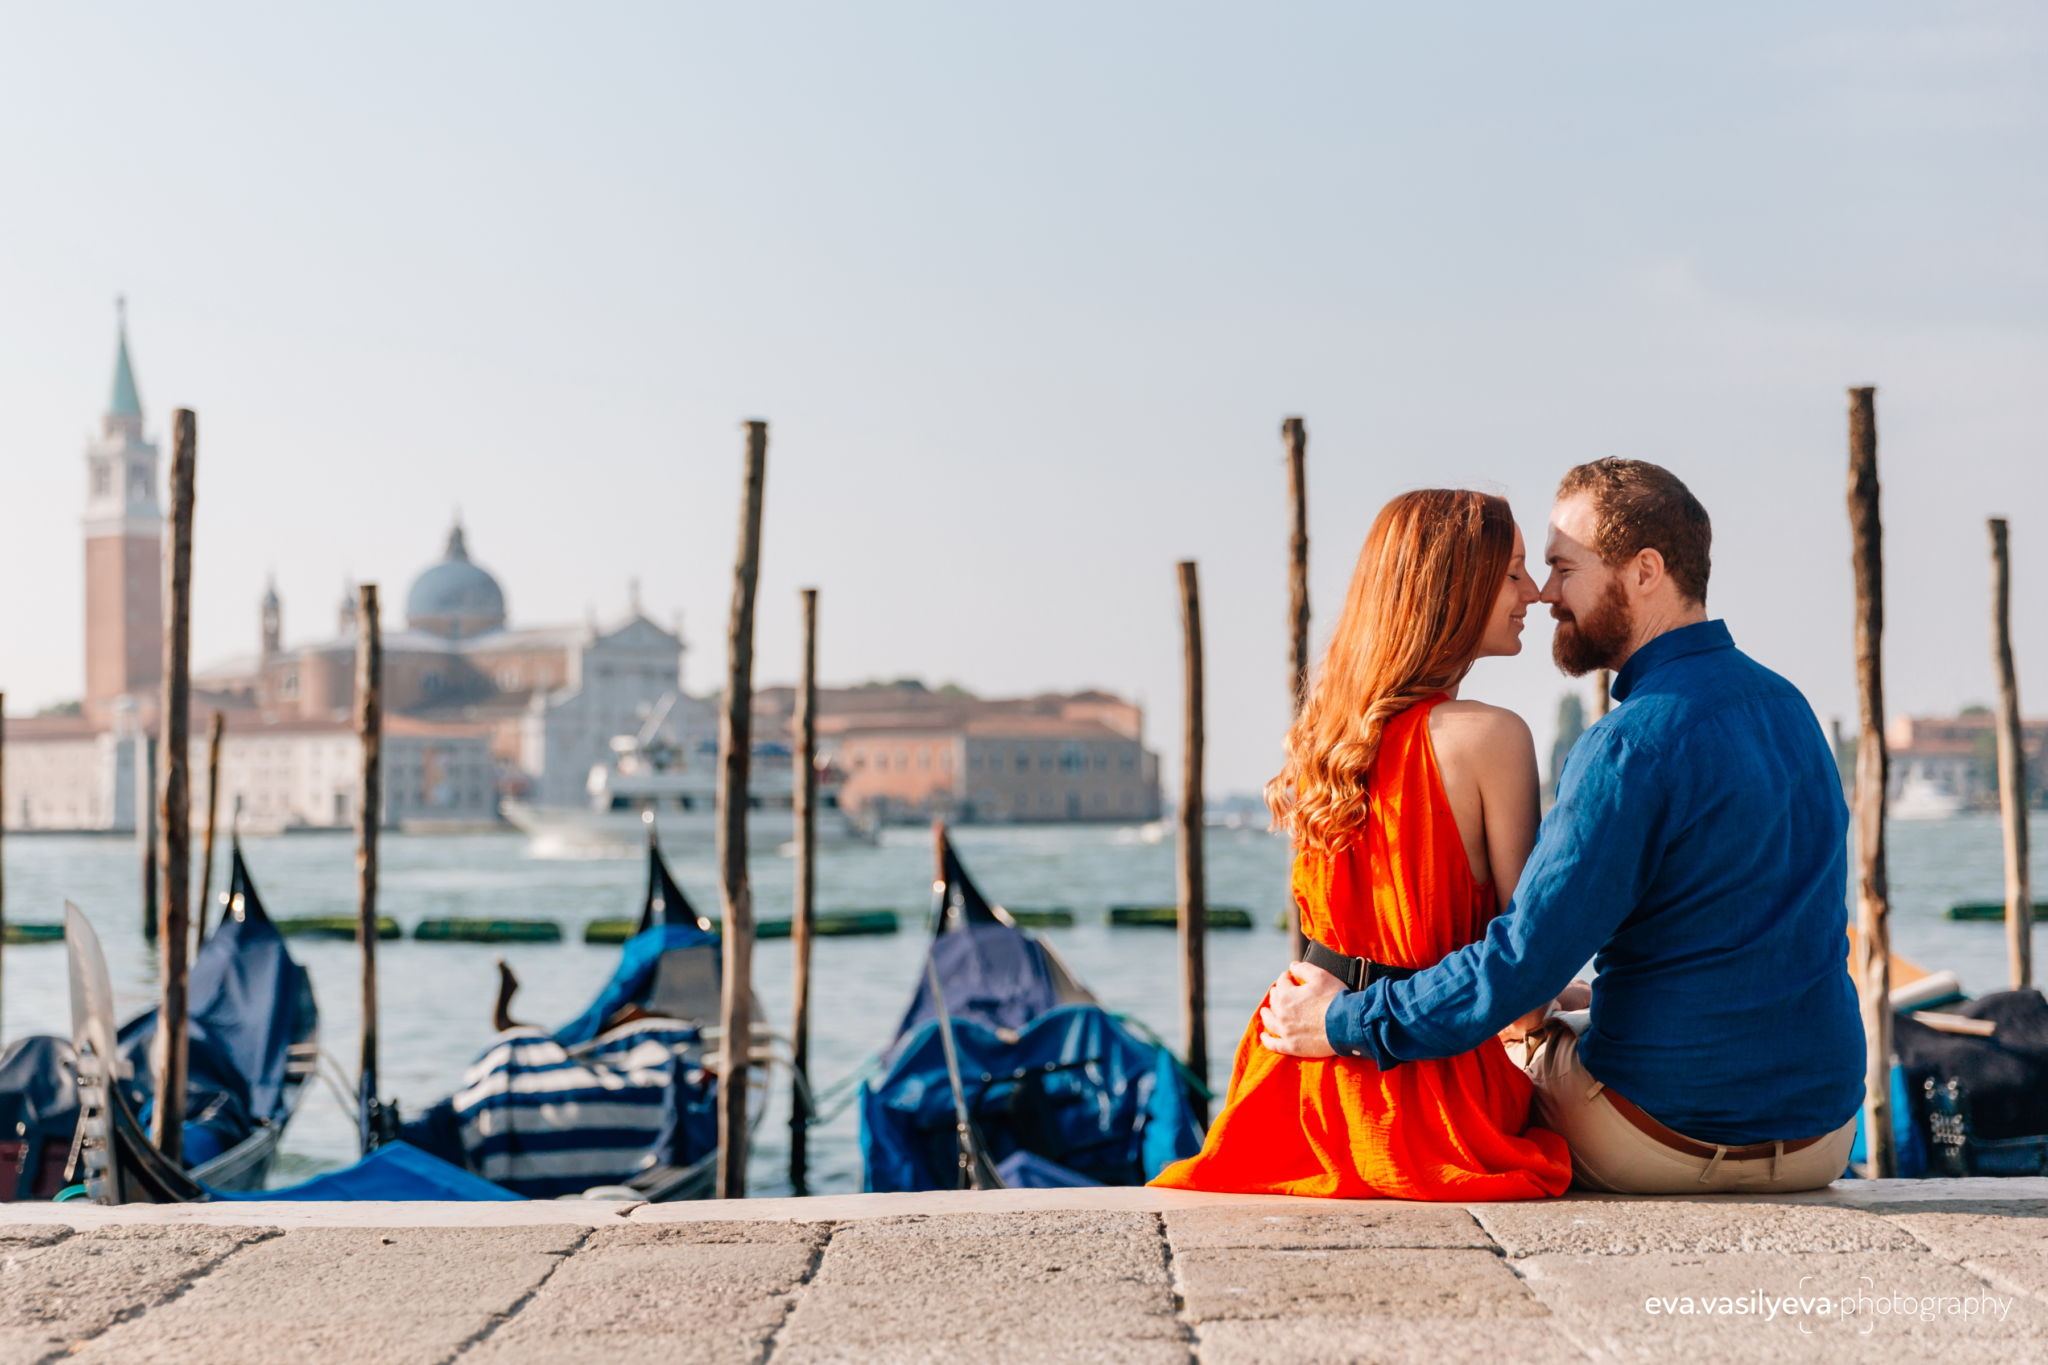 Surprise Proposal in Venice, предложение руки и сердца